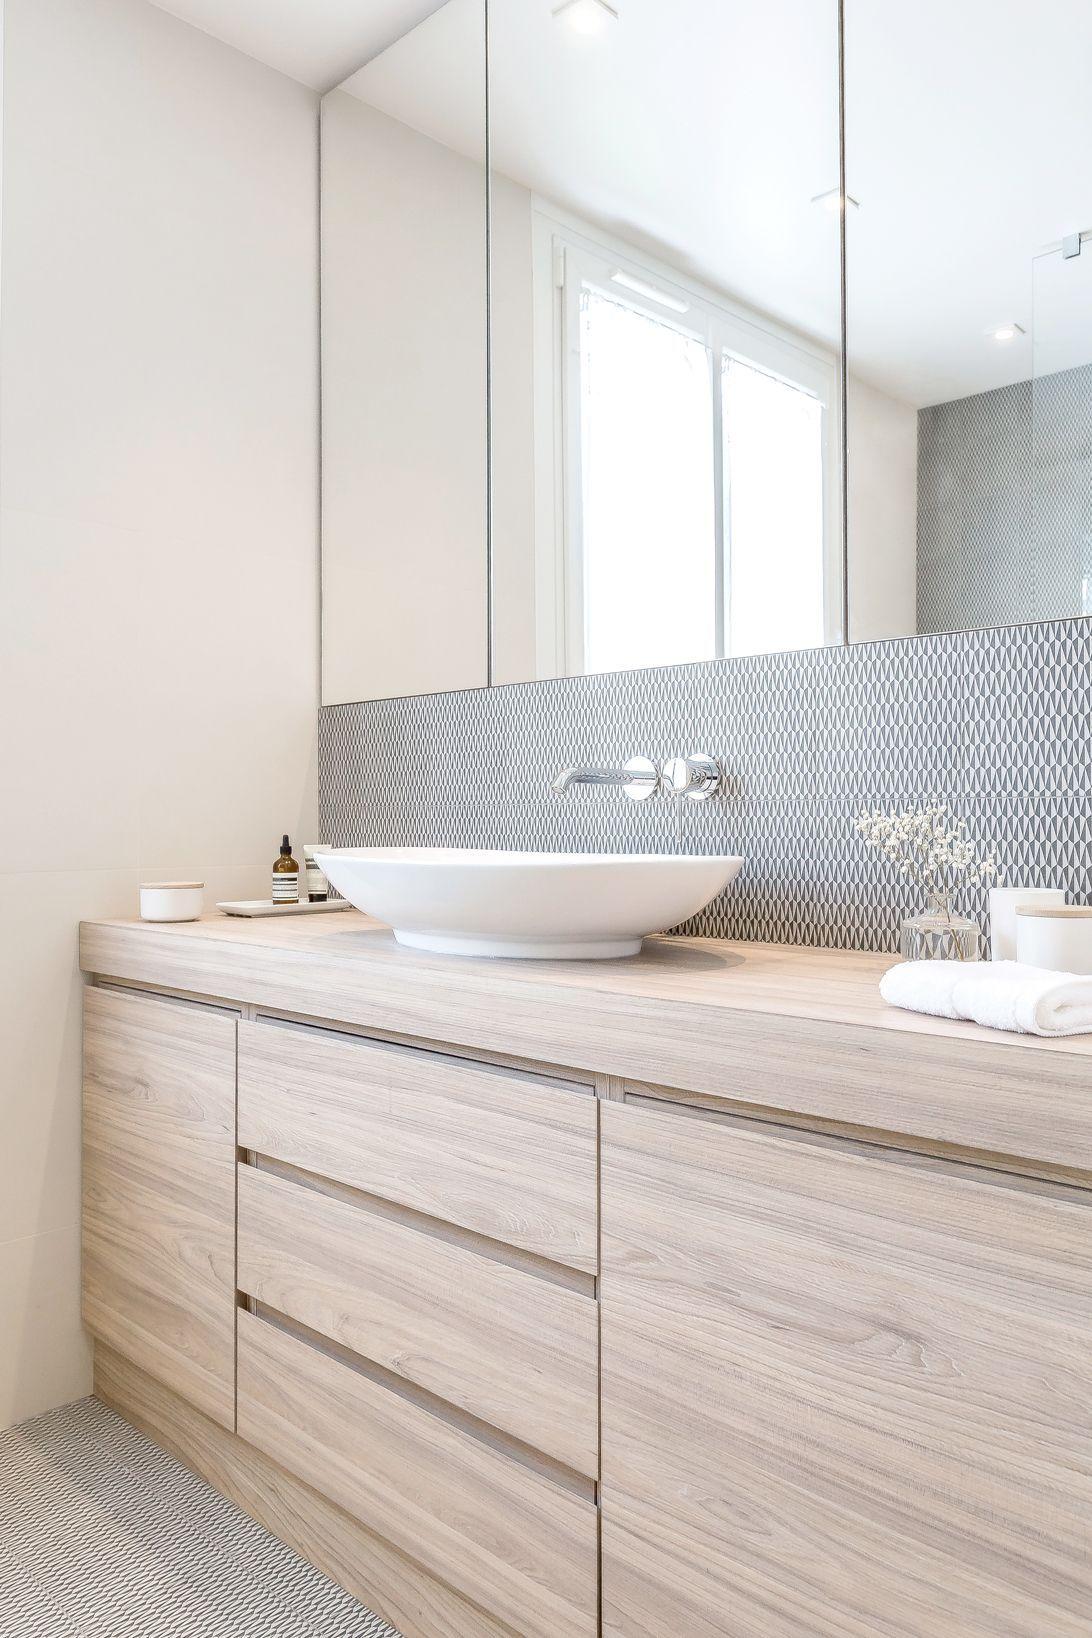 Best Kitchen Gallery: 6 Tips To Make Your Bathroom Renovation Look Amazing Modern of Designer Bathroom Cabinets  on rachelxblog.com